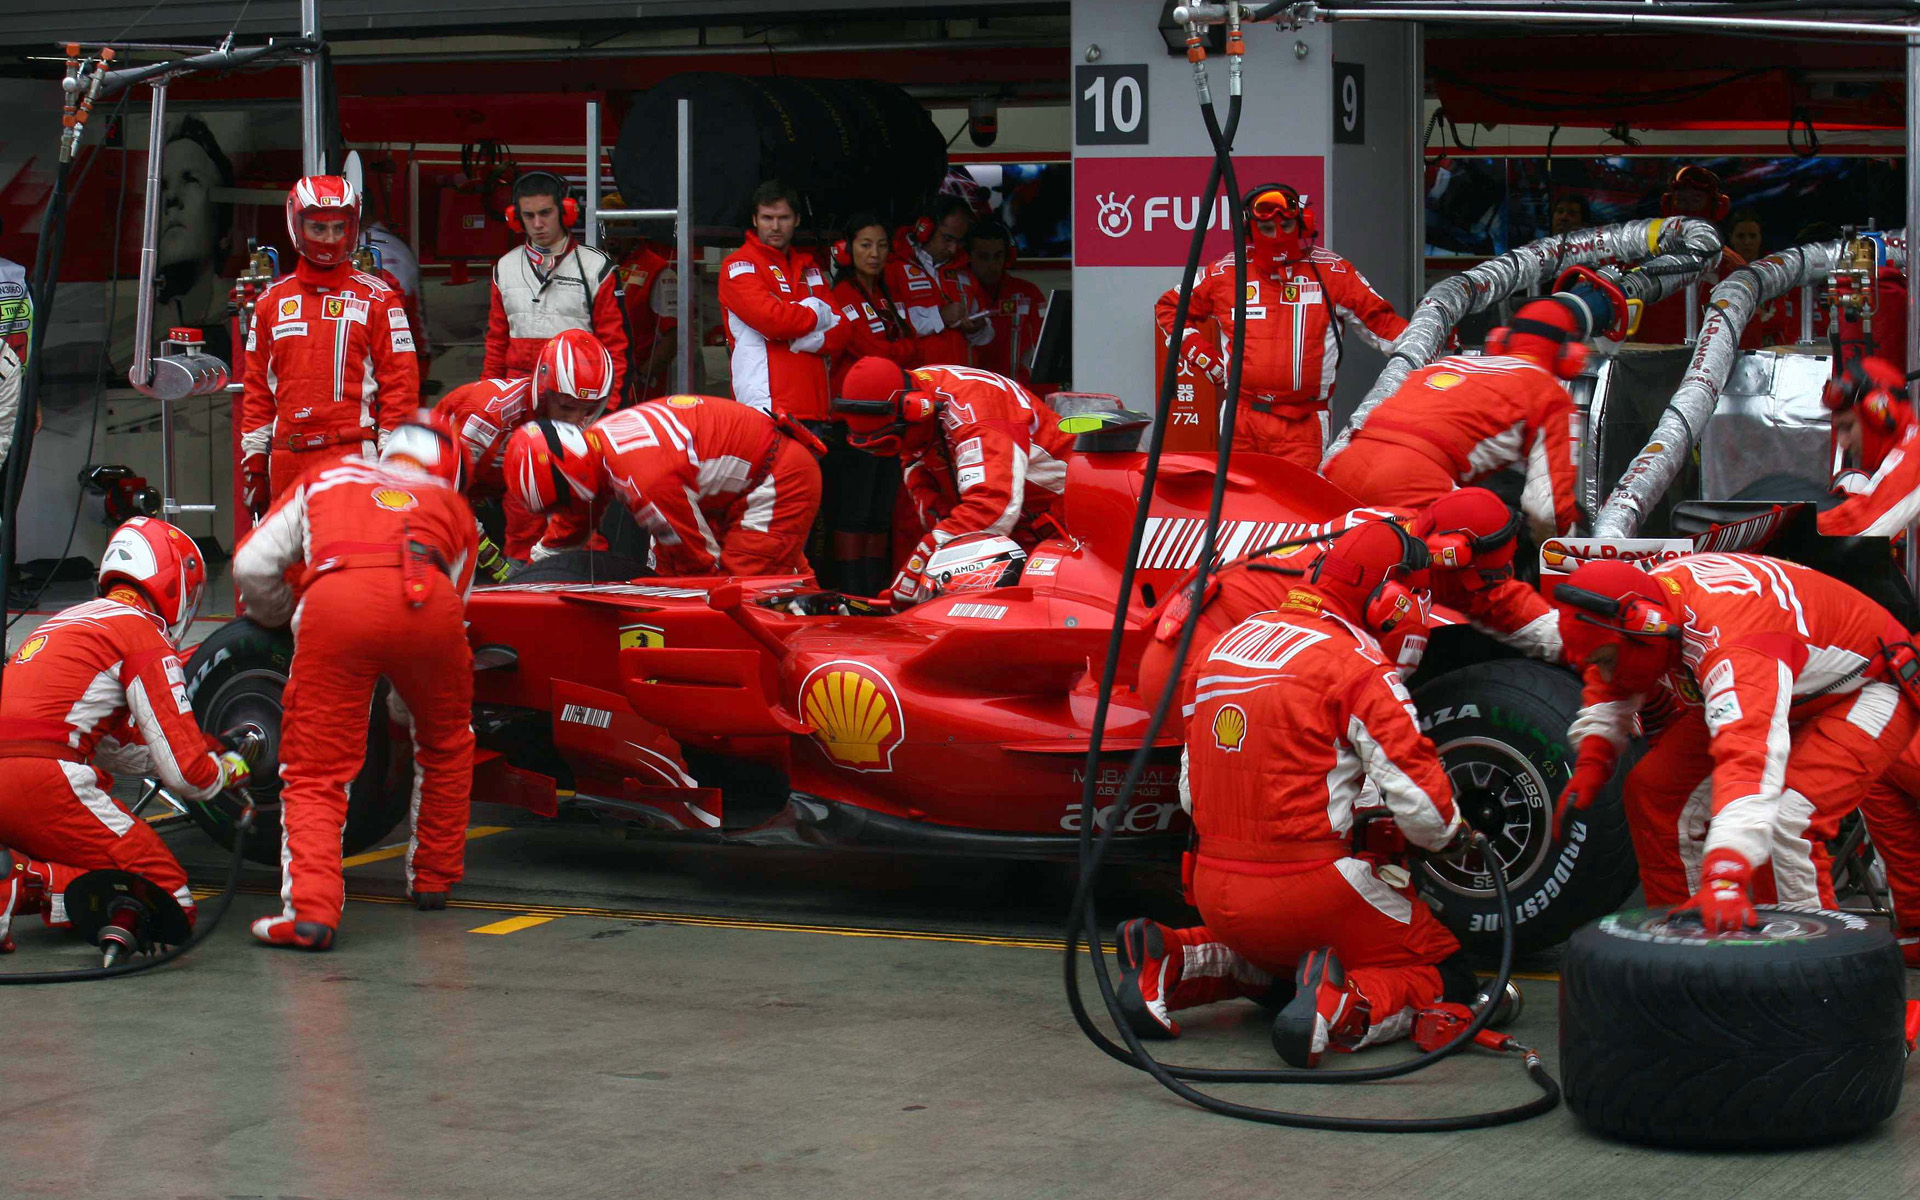 Mount Fuji Cars Ferrari Formula One Vehicles Iceman Kimi